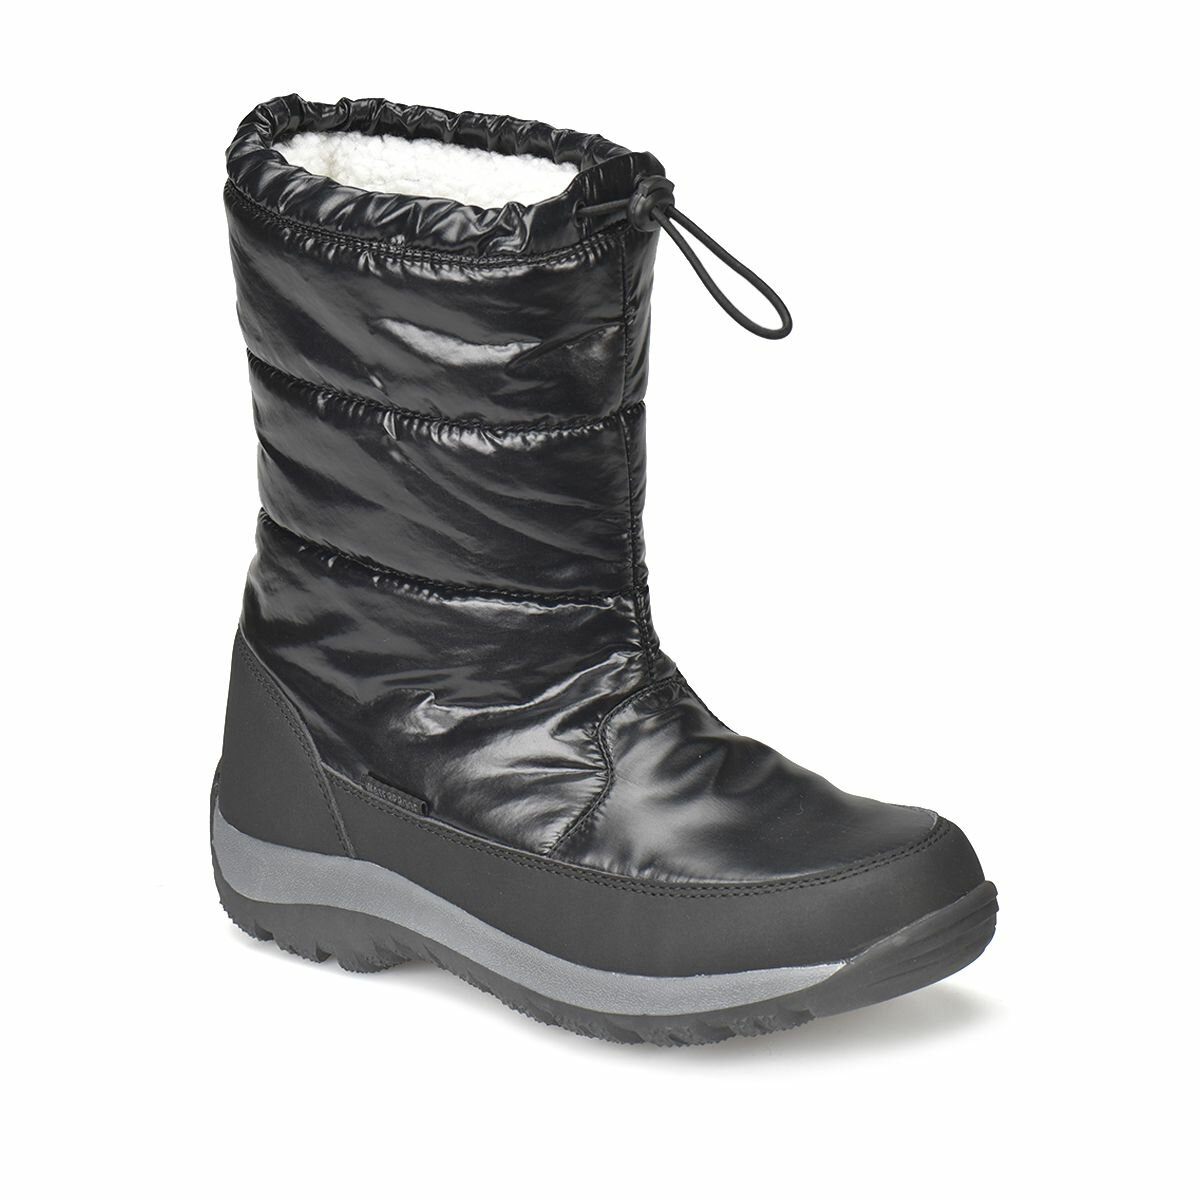 FLO JAIDA Black Women Outdoor Boots LUMBERJACK